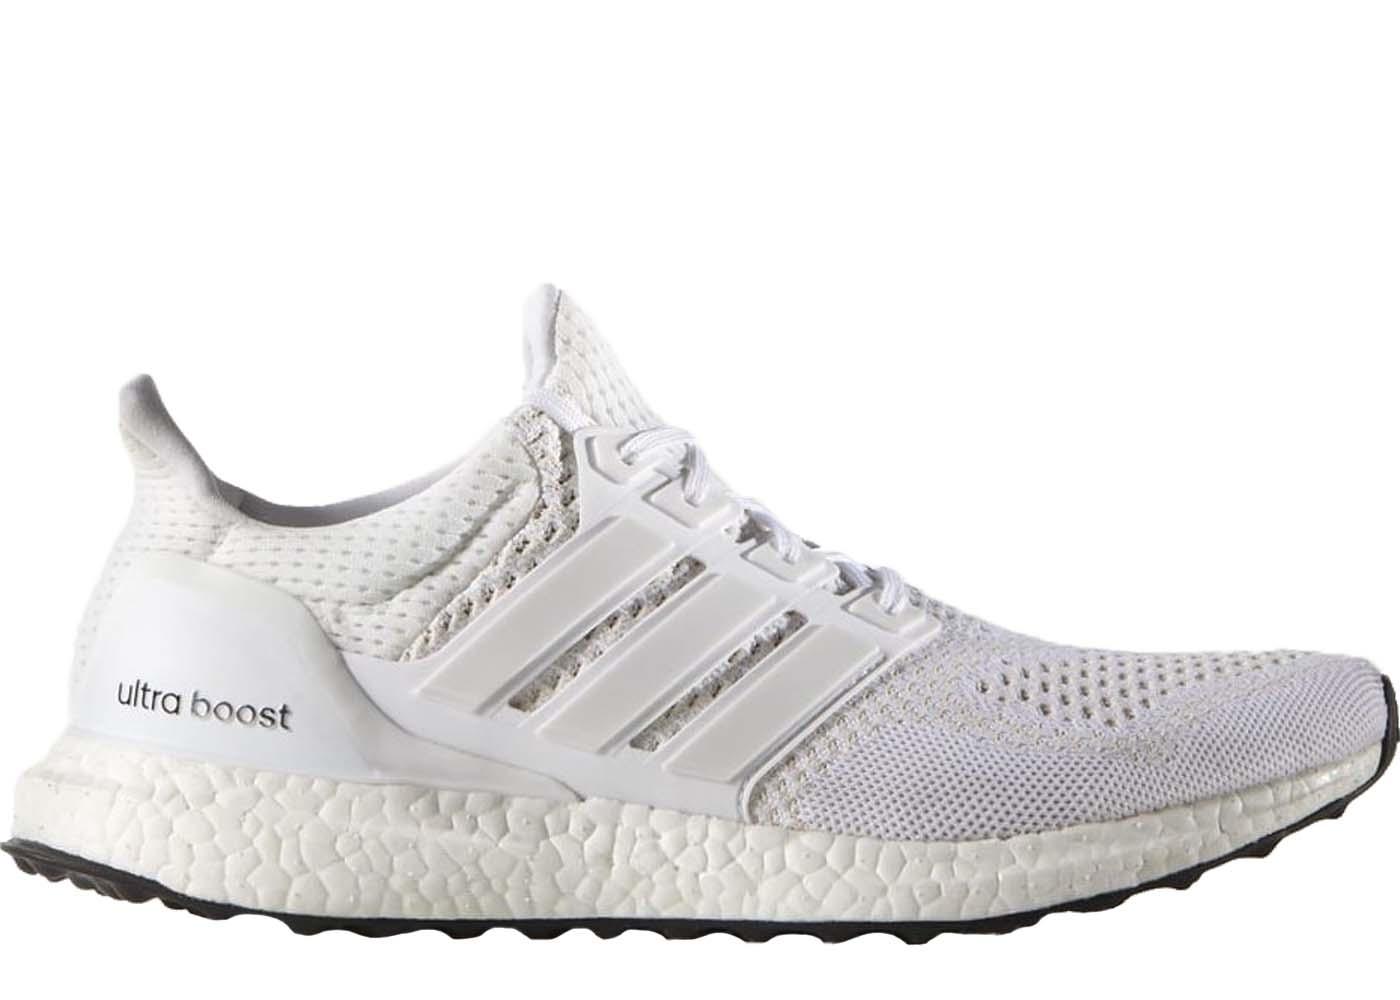 92ad80540b701 adidas UltraBOOST 1.0 White